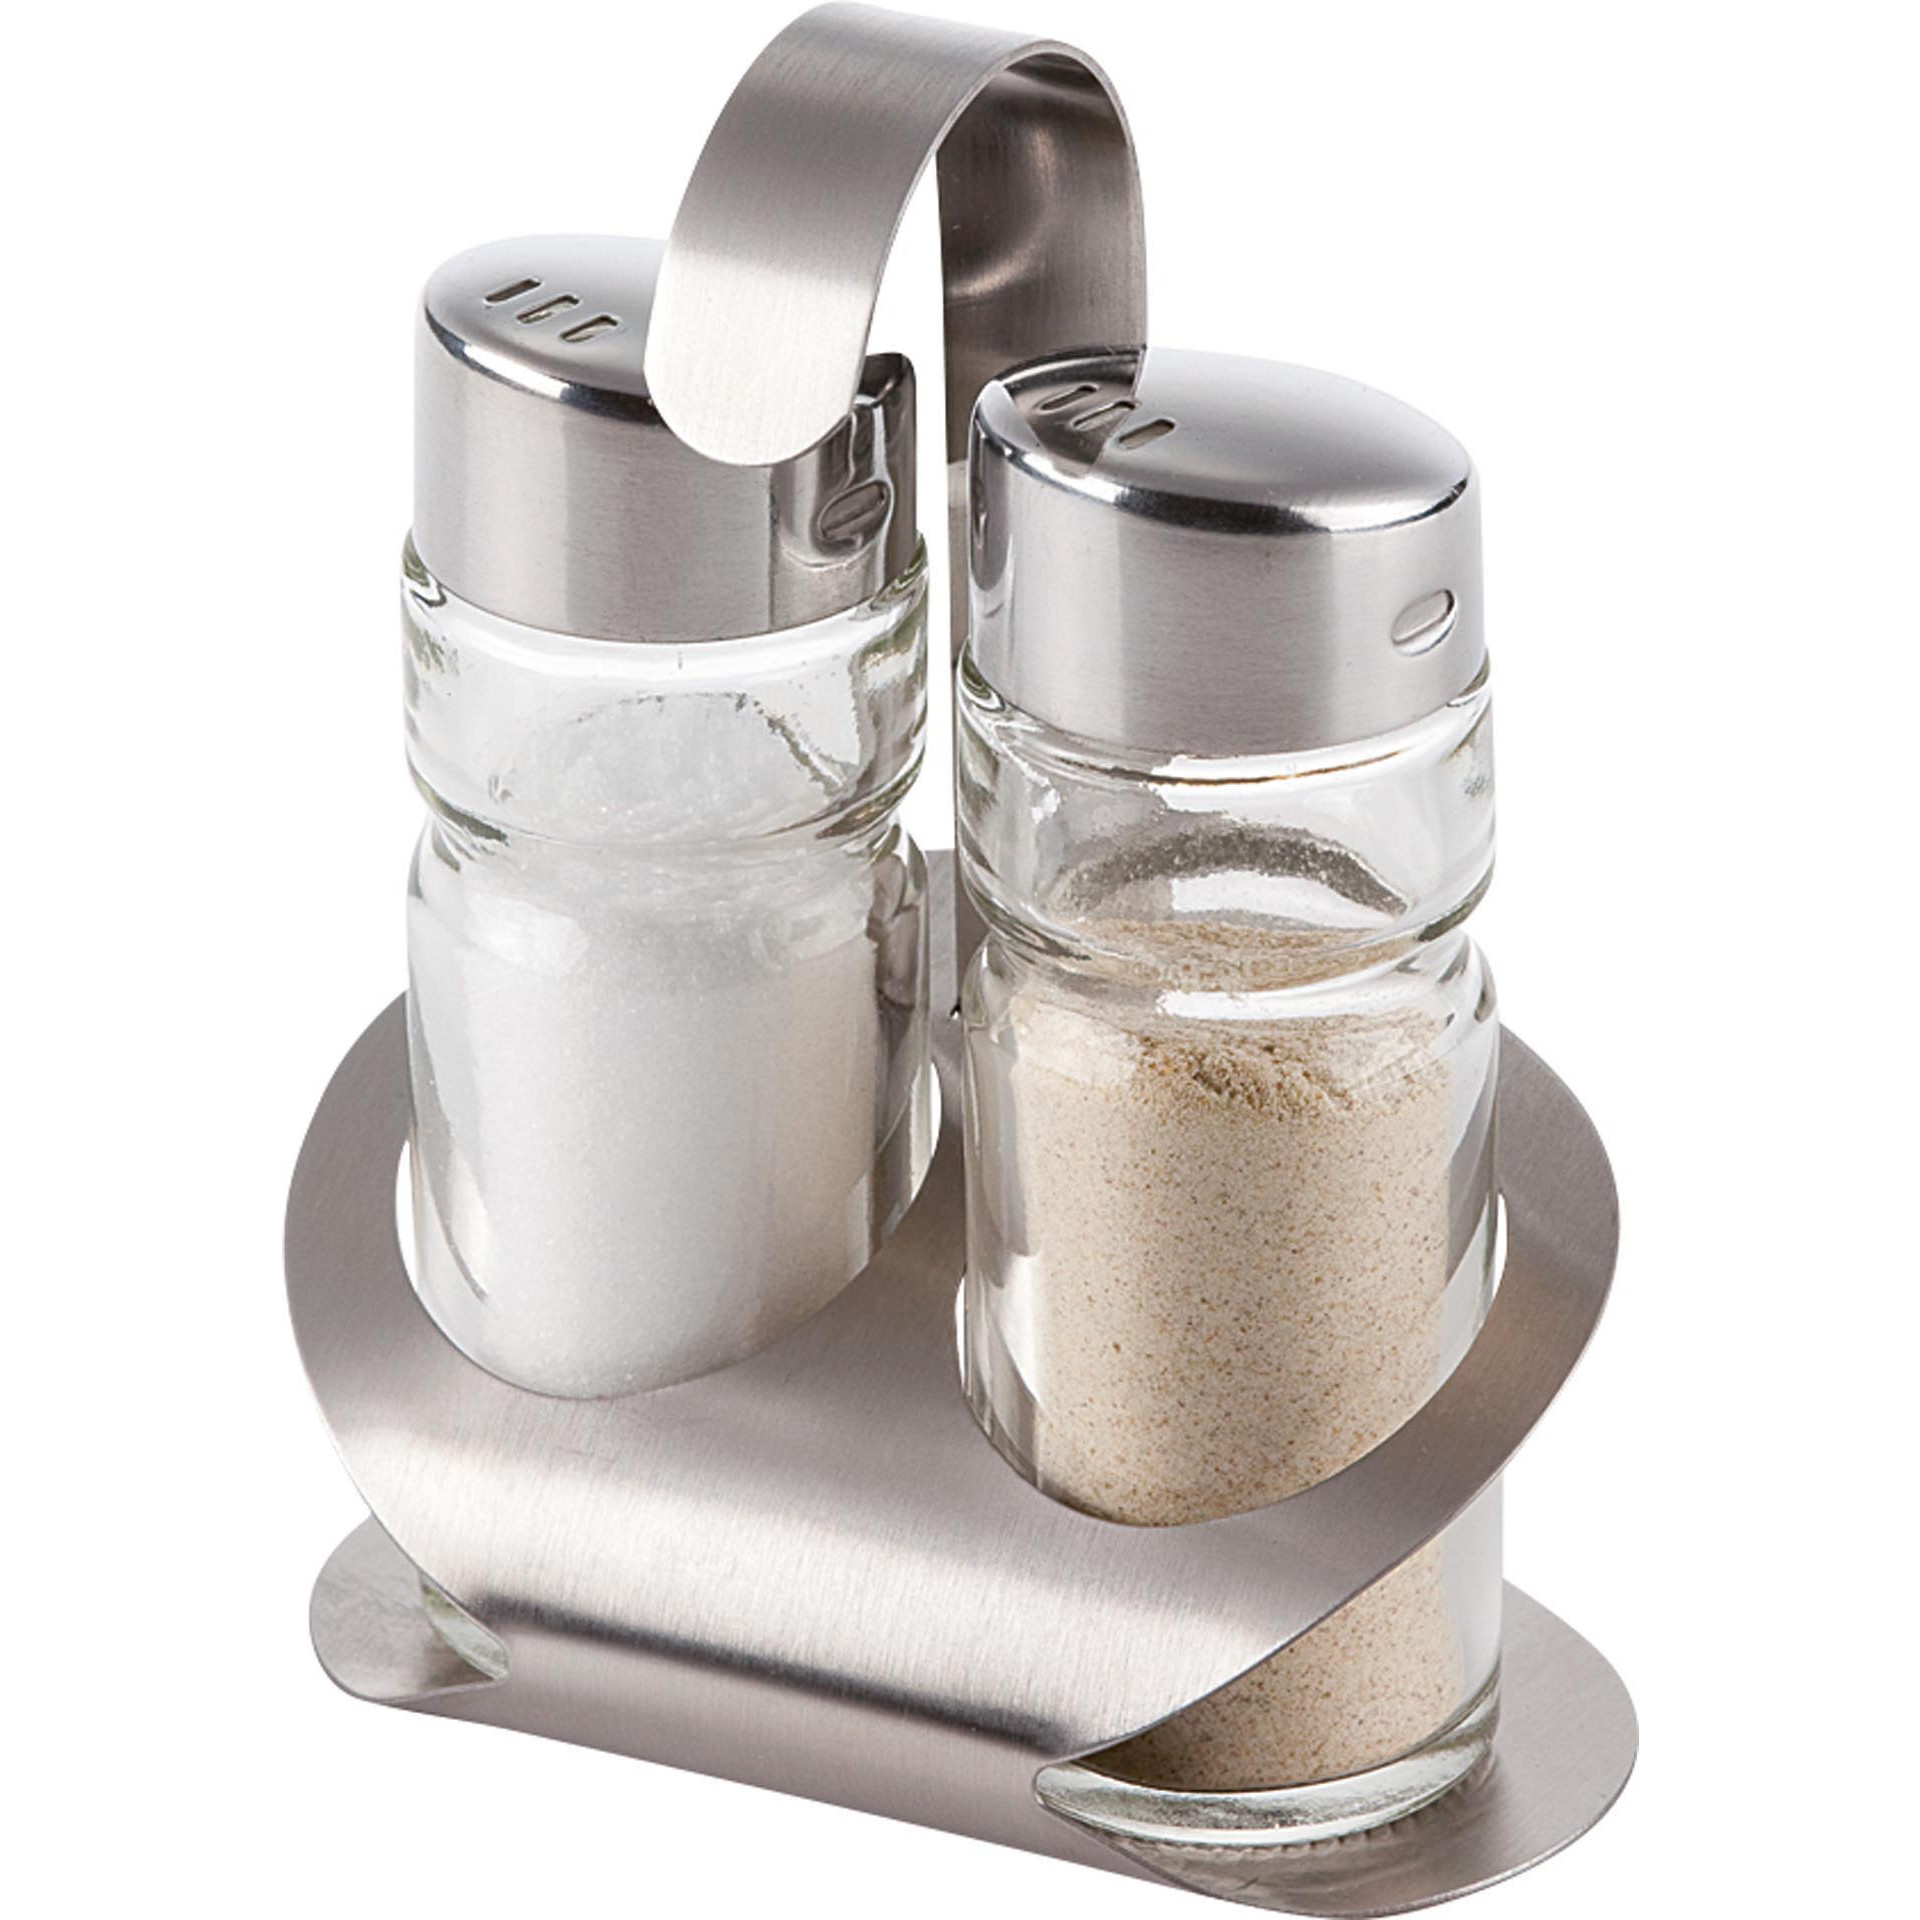 Menagen-Set Salz & Pfeffer